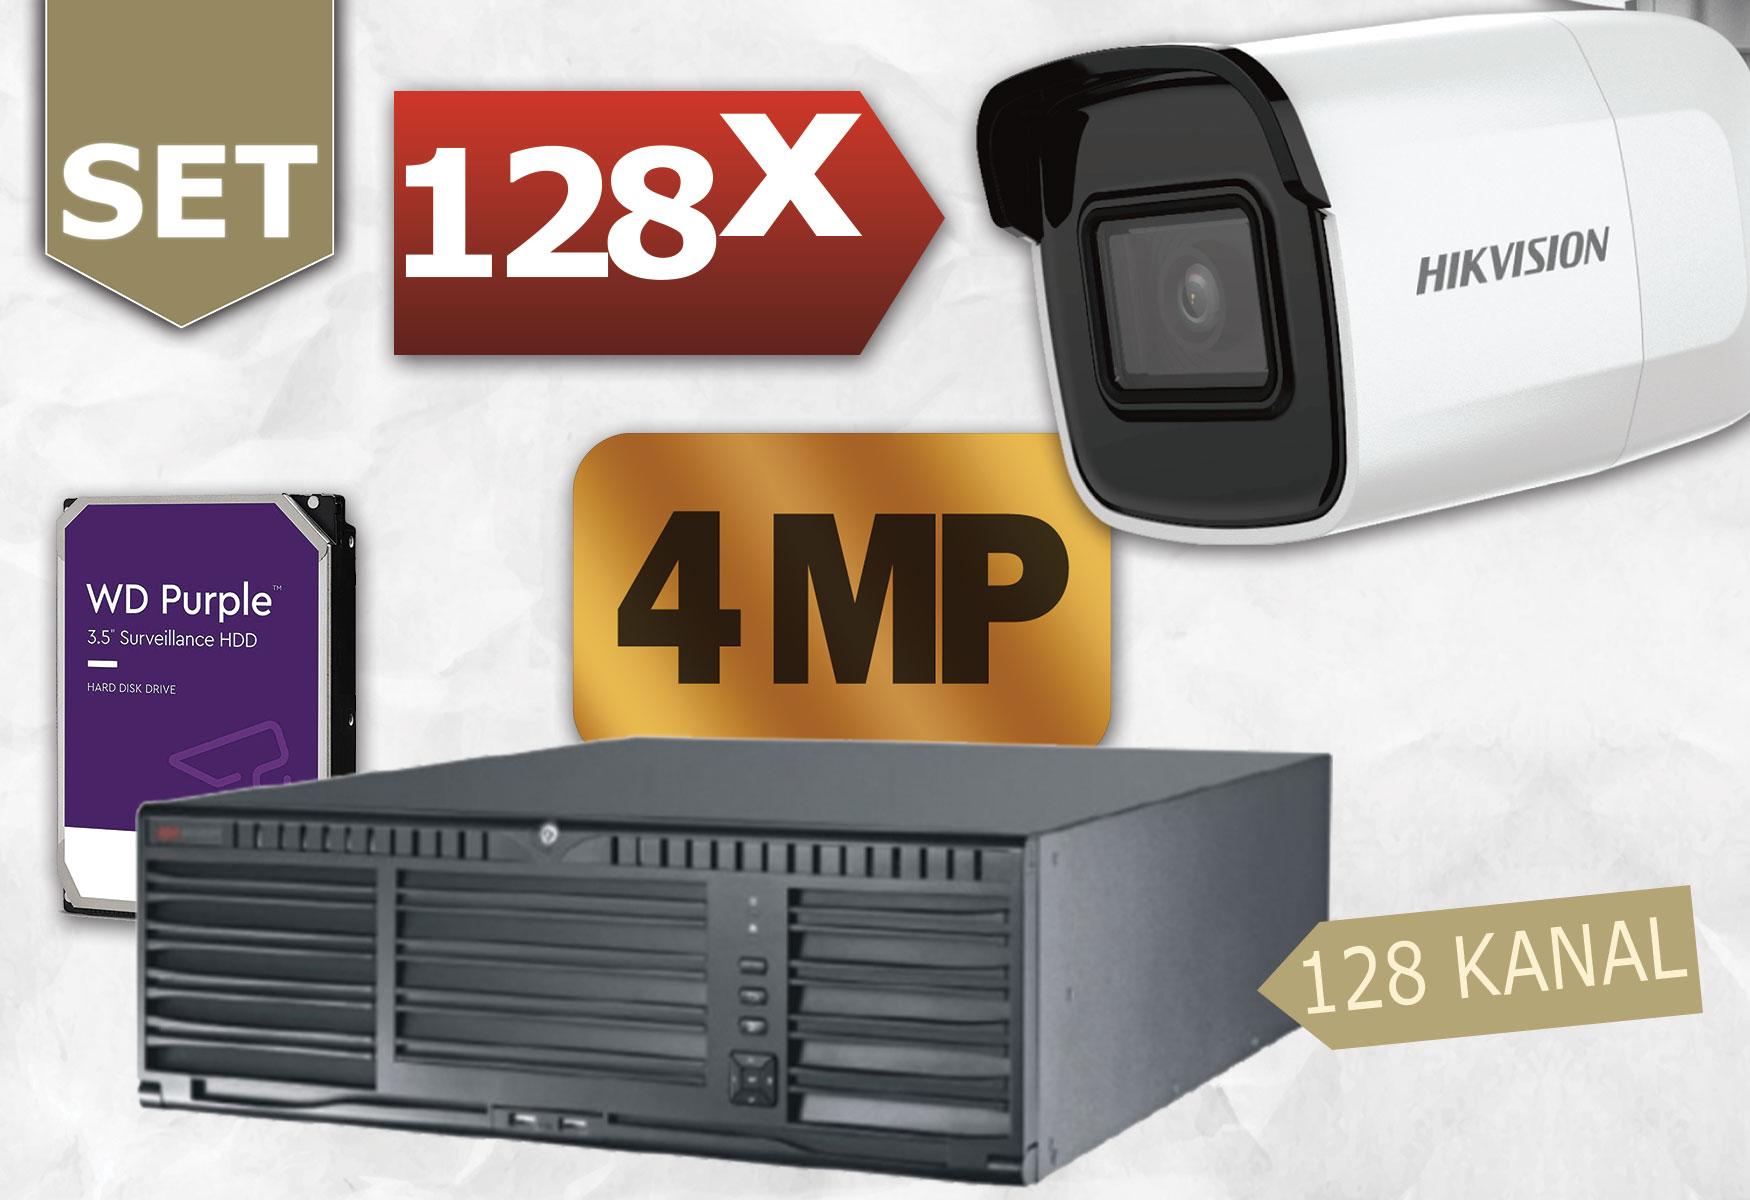 Ueberwachung-128Kanal-128x-Bullet-4MP-Produkt-Grafiken-Ueberwachungskamer-Sets-ab-16-Kameras-IP.jpg